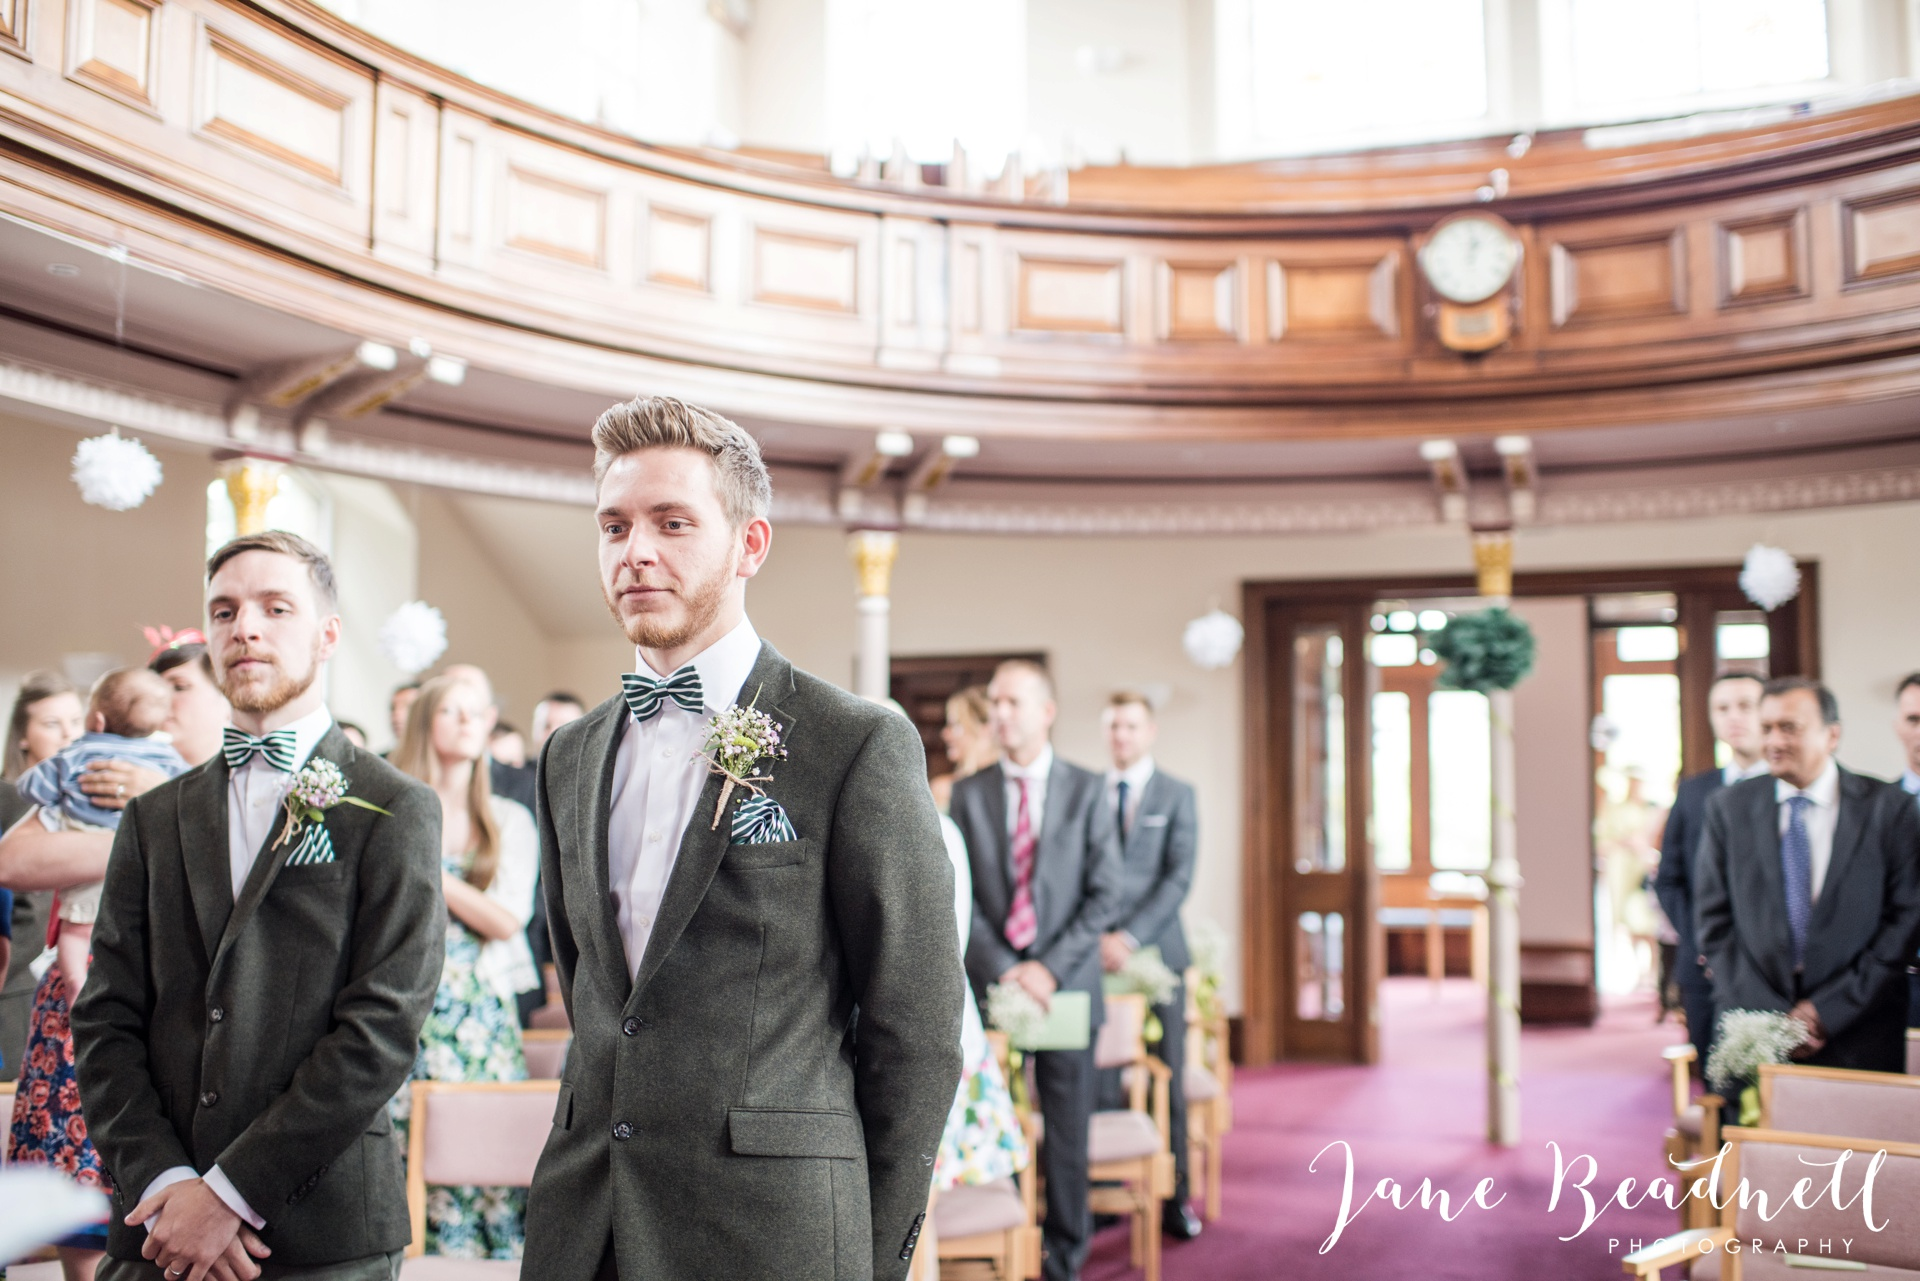 Jane Beadnell fine art wedding photographer The Old Deanery Ripon_0023